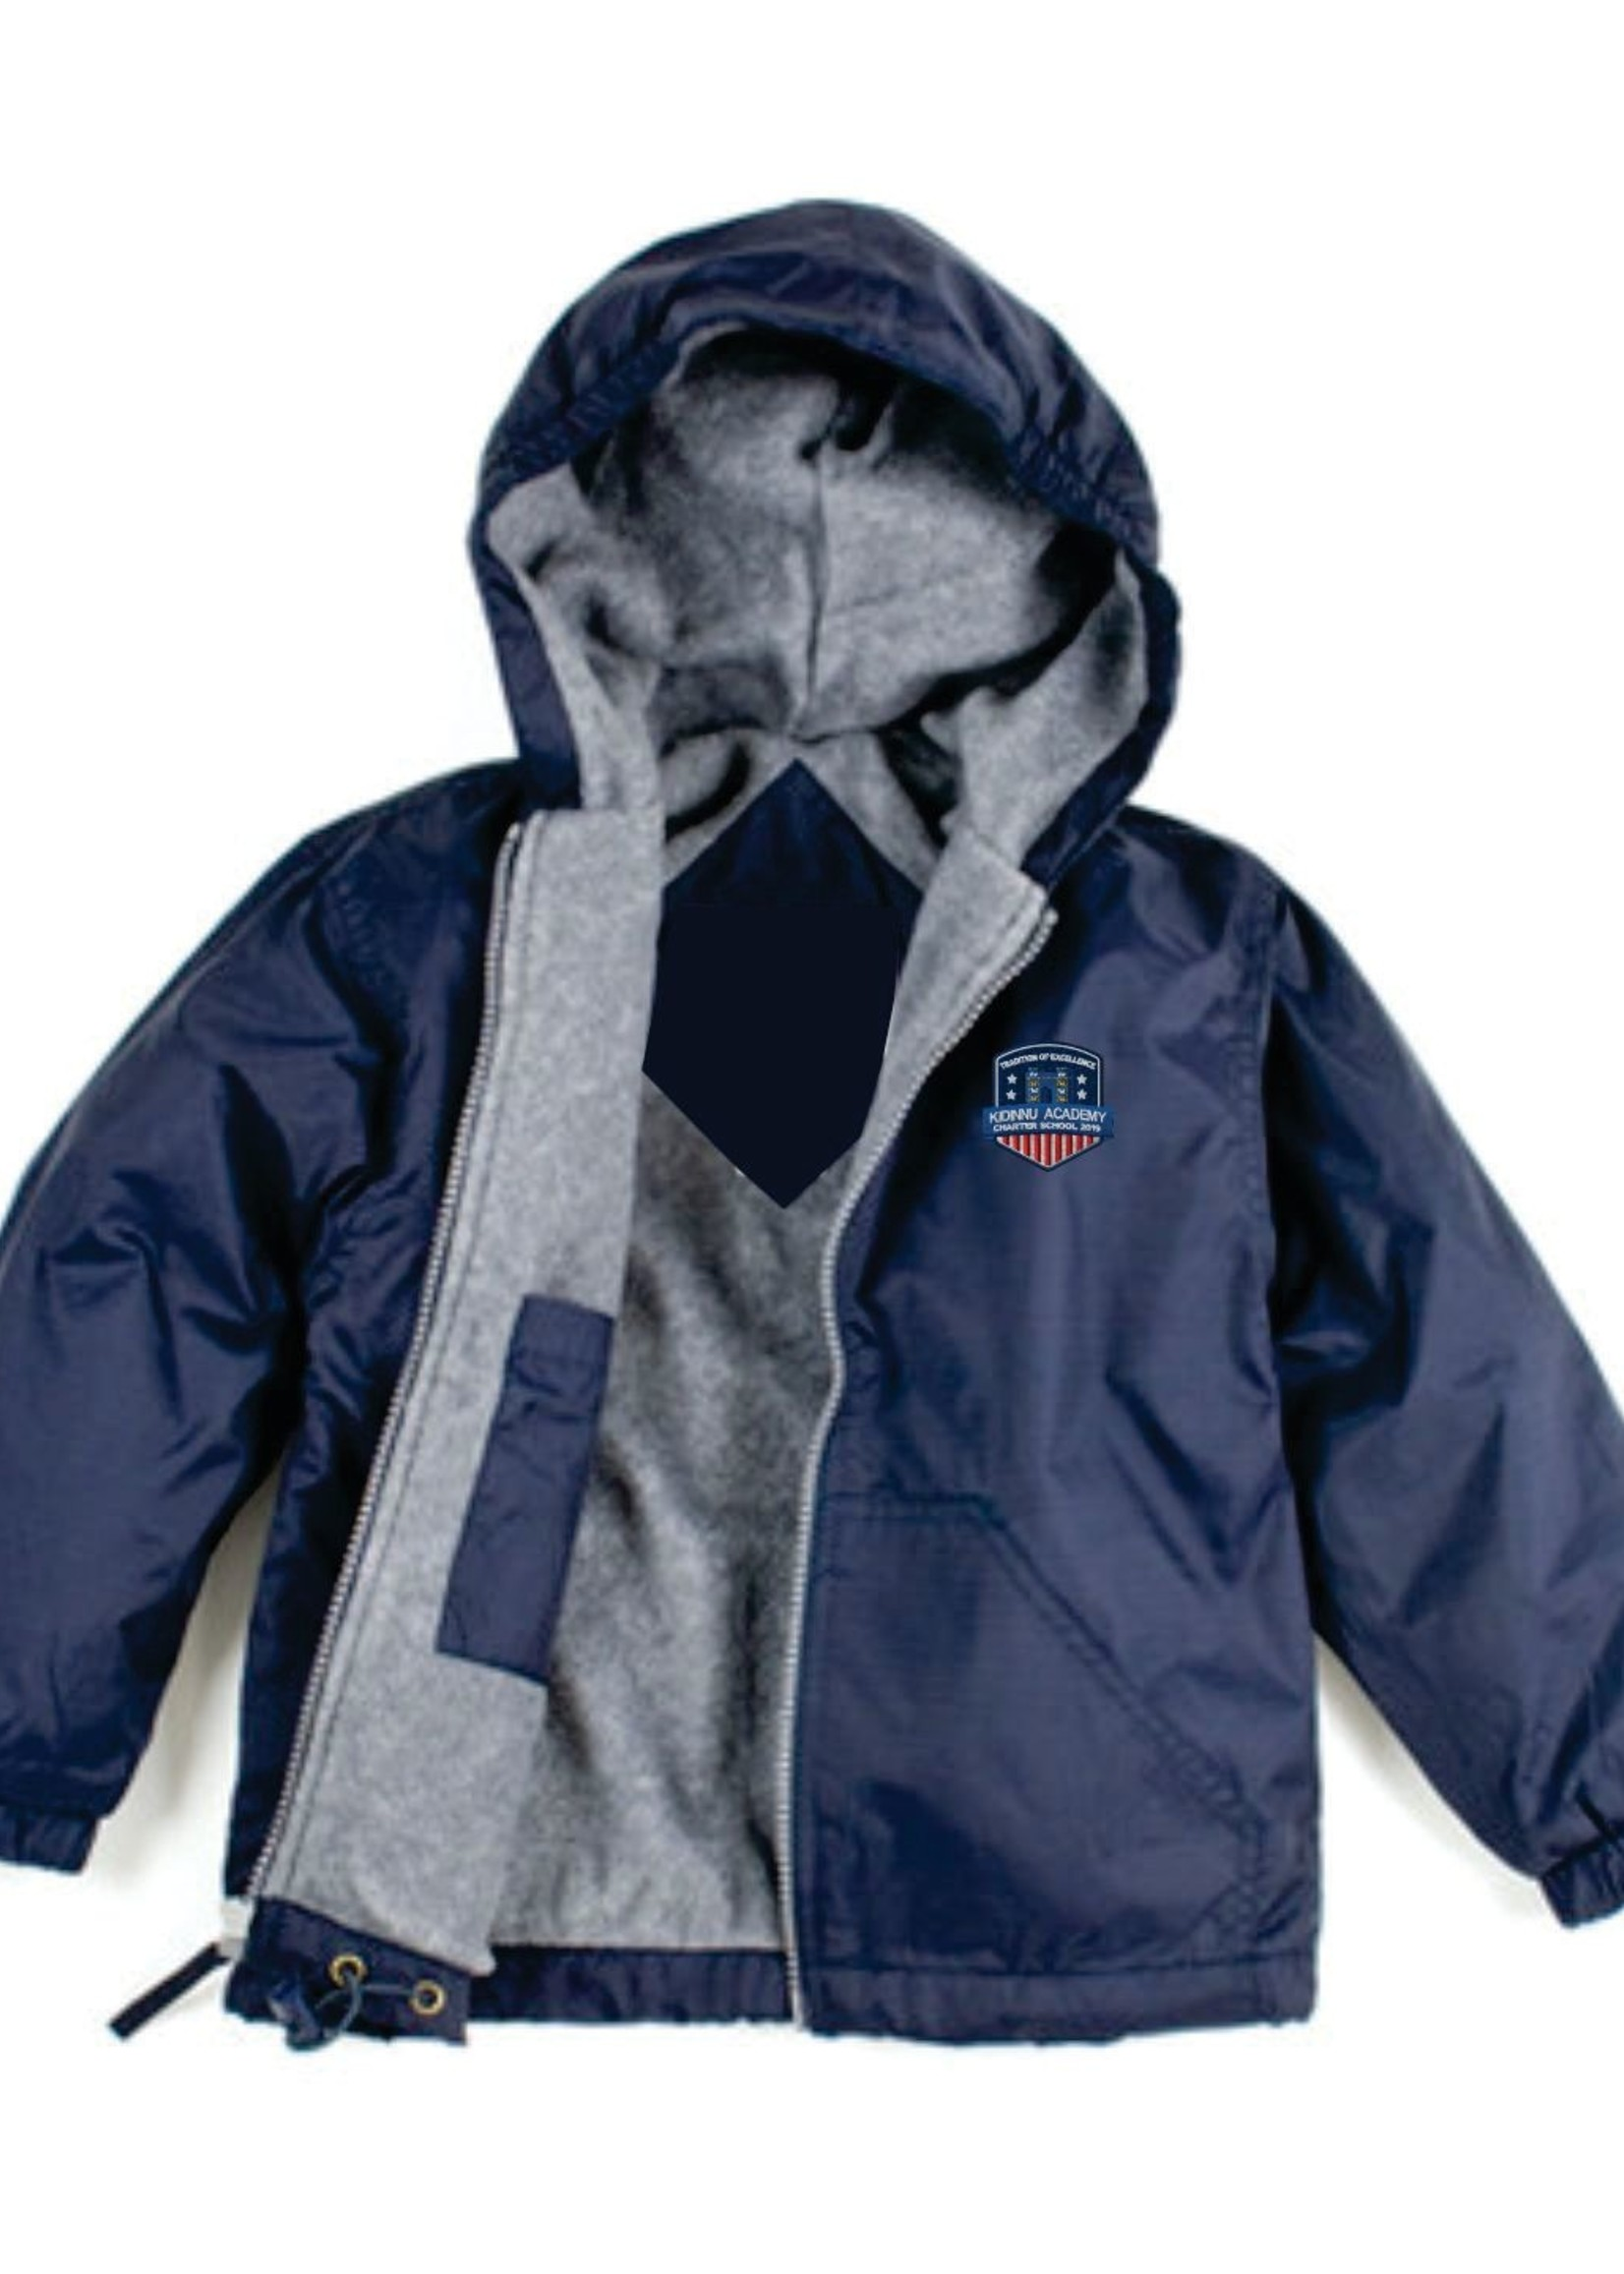 TUS KACS Navy Windbreaker Hooded Jacket